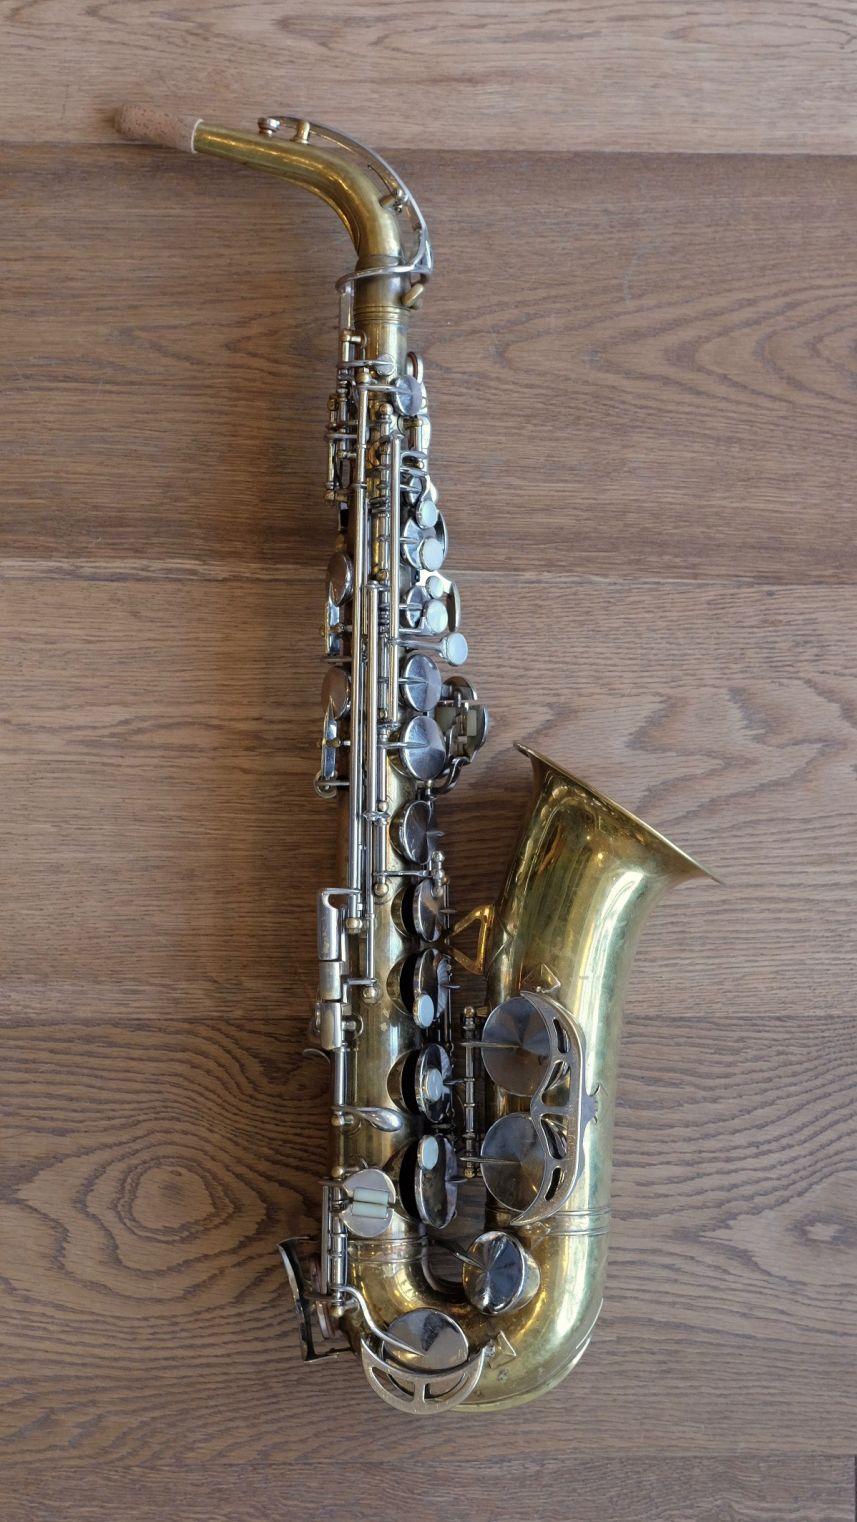 (Used) King Zephyr Series II alto sax circa 1960